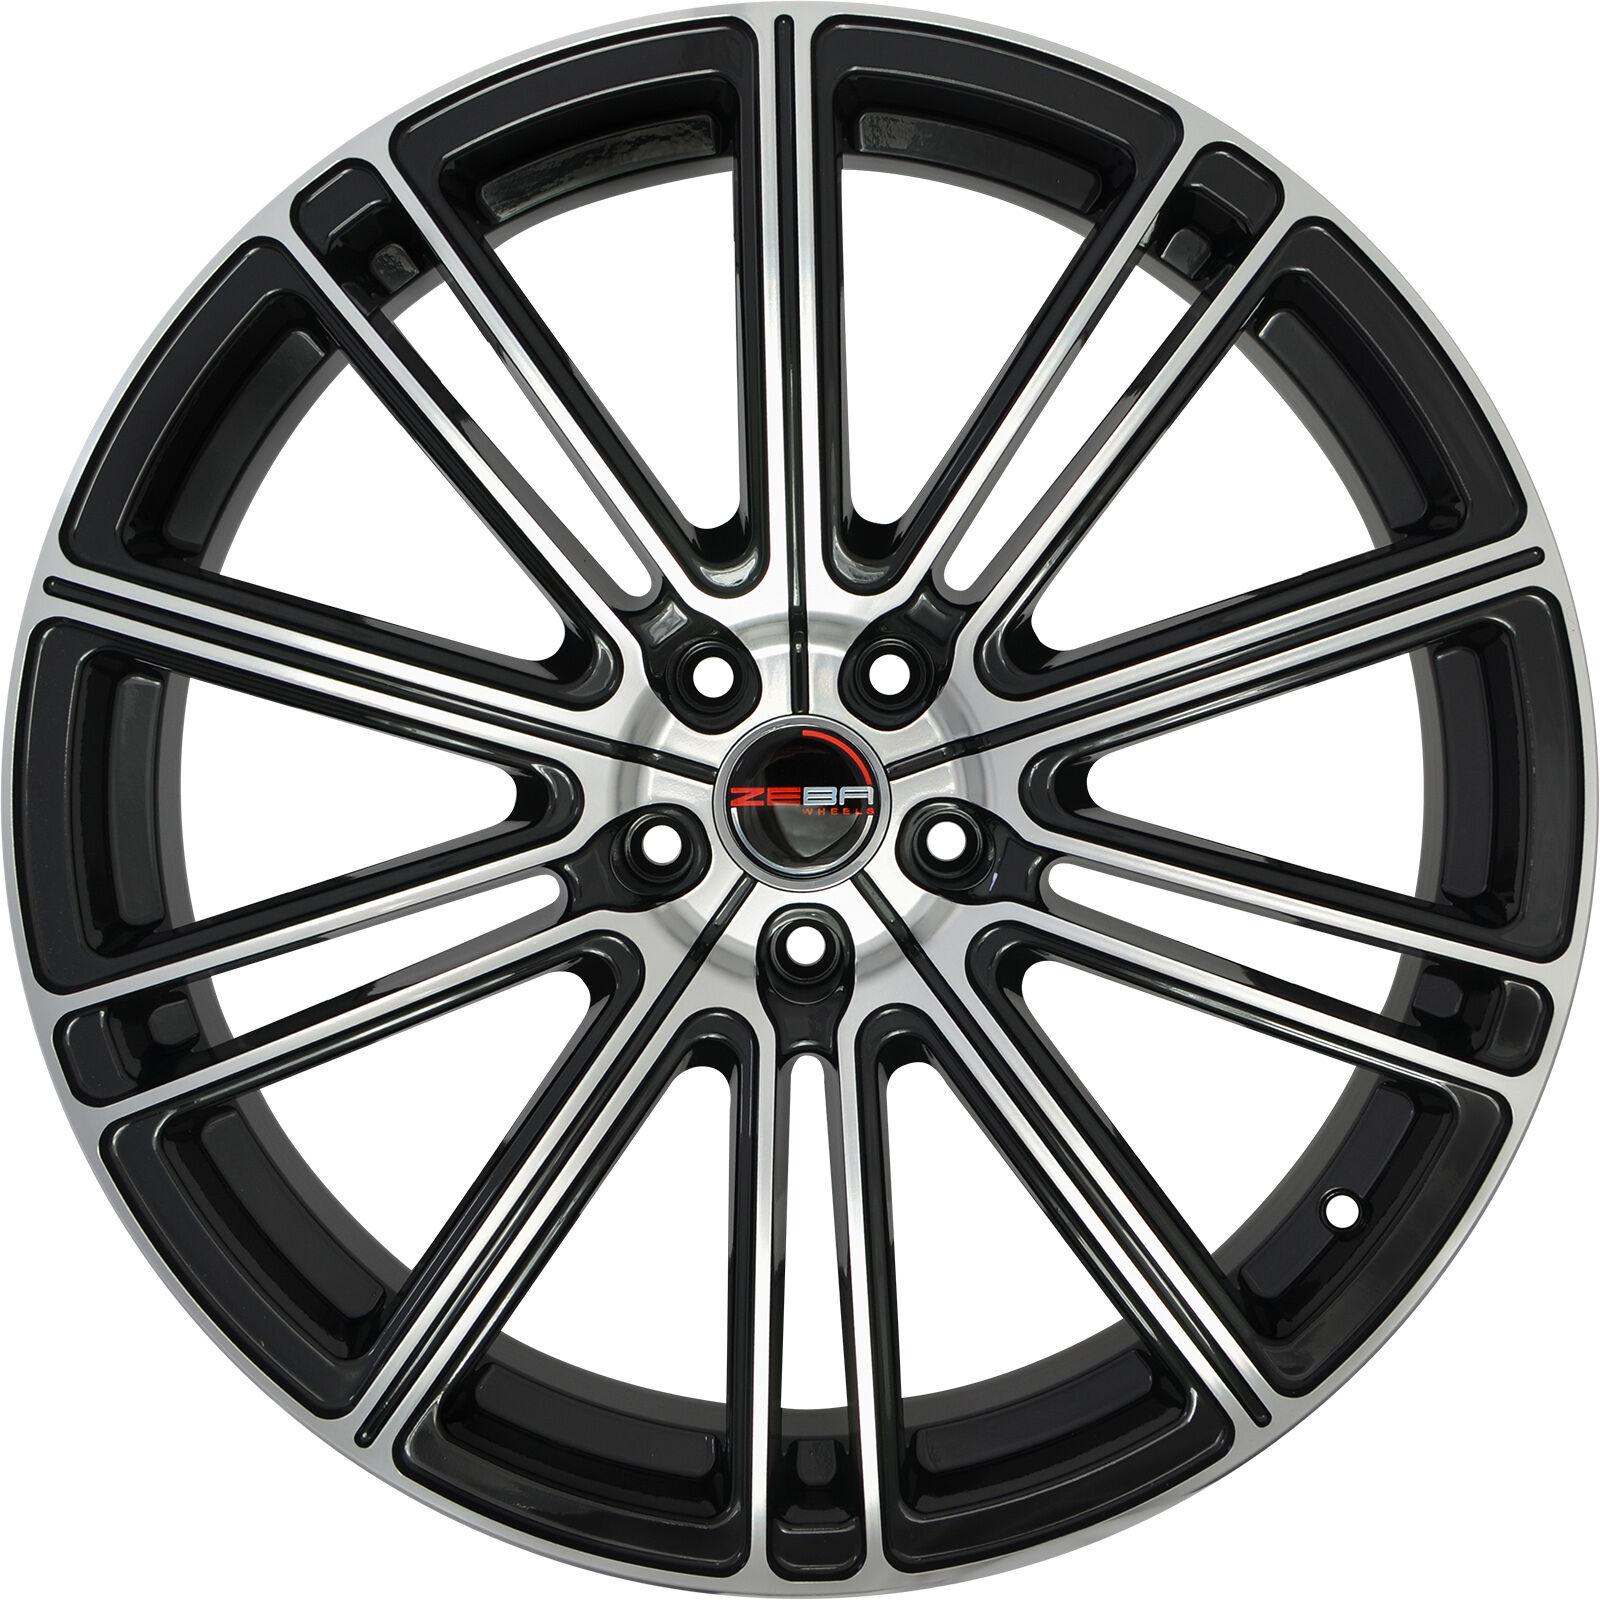 4 GWG Wheels 22 inch Black Machined FLOW Rims fits INFINITI QX70 2014 - 2018